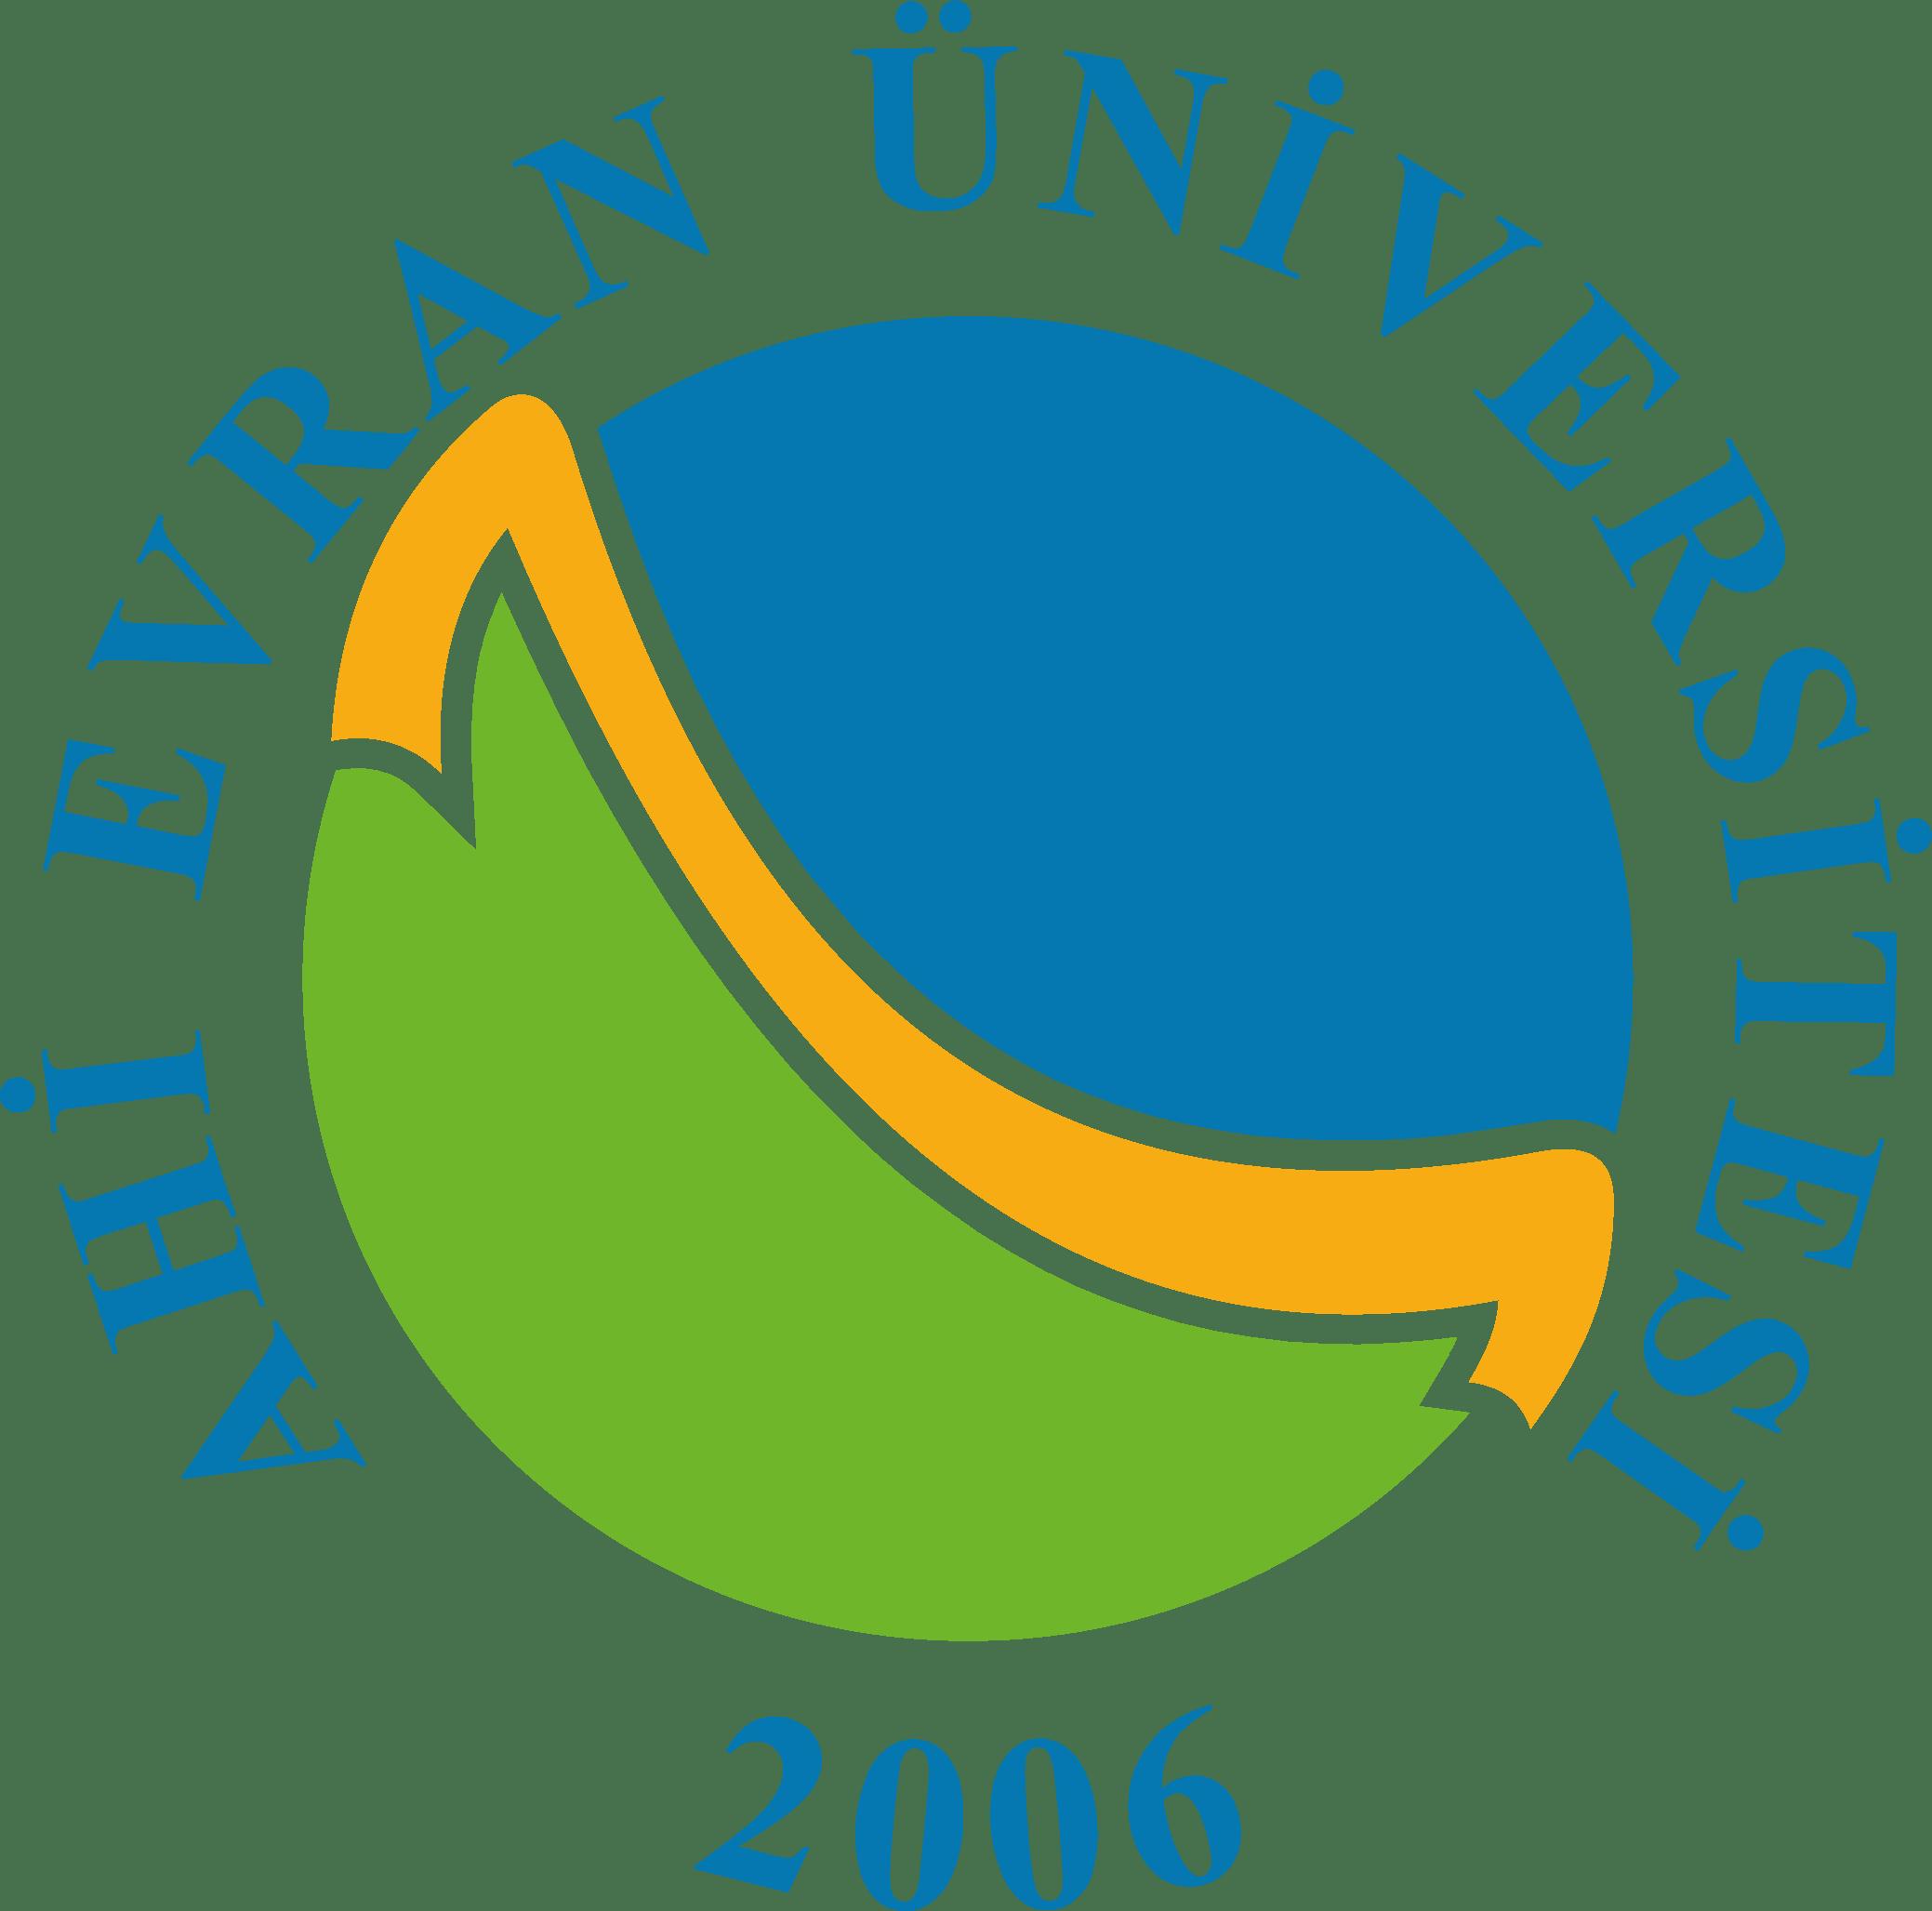 Ahi Evran Üniversitesi Logo   Amblem png